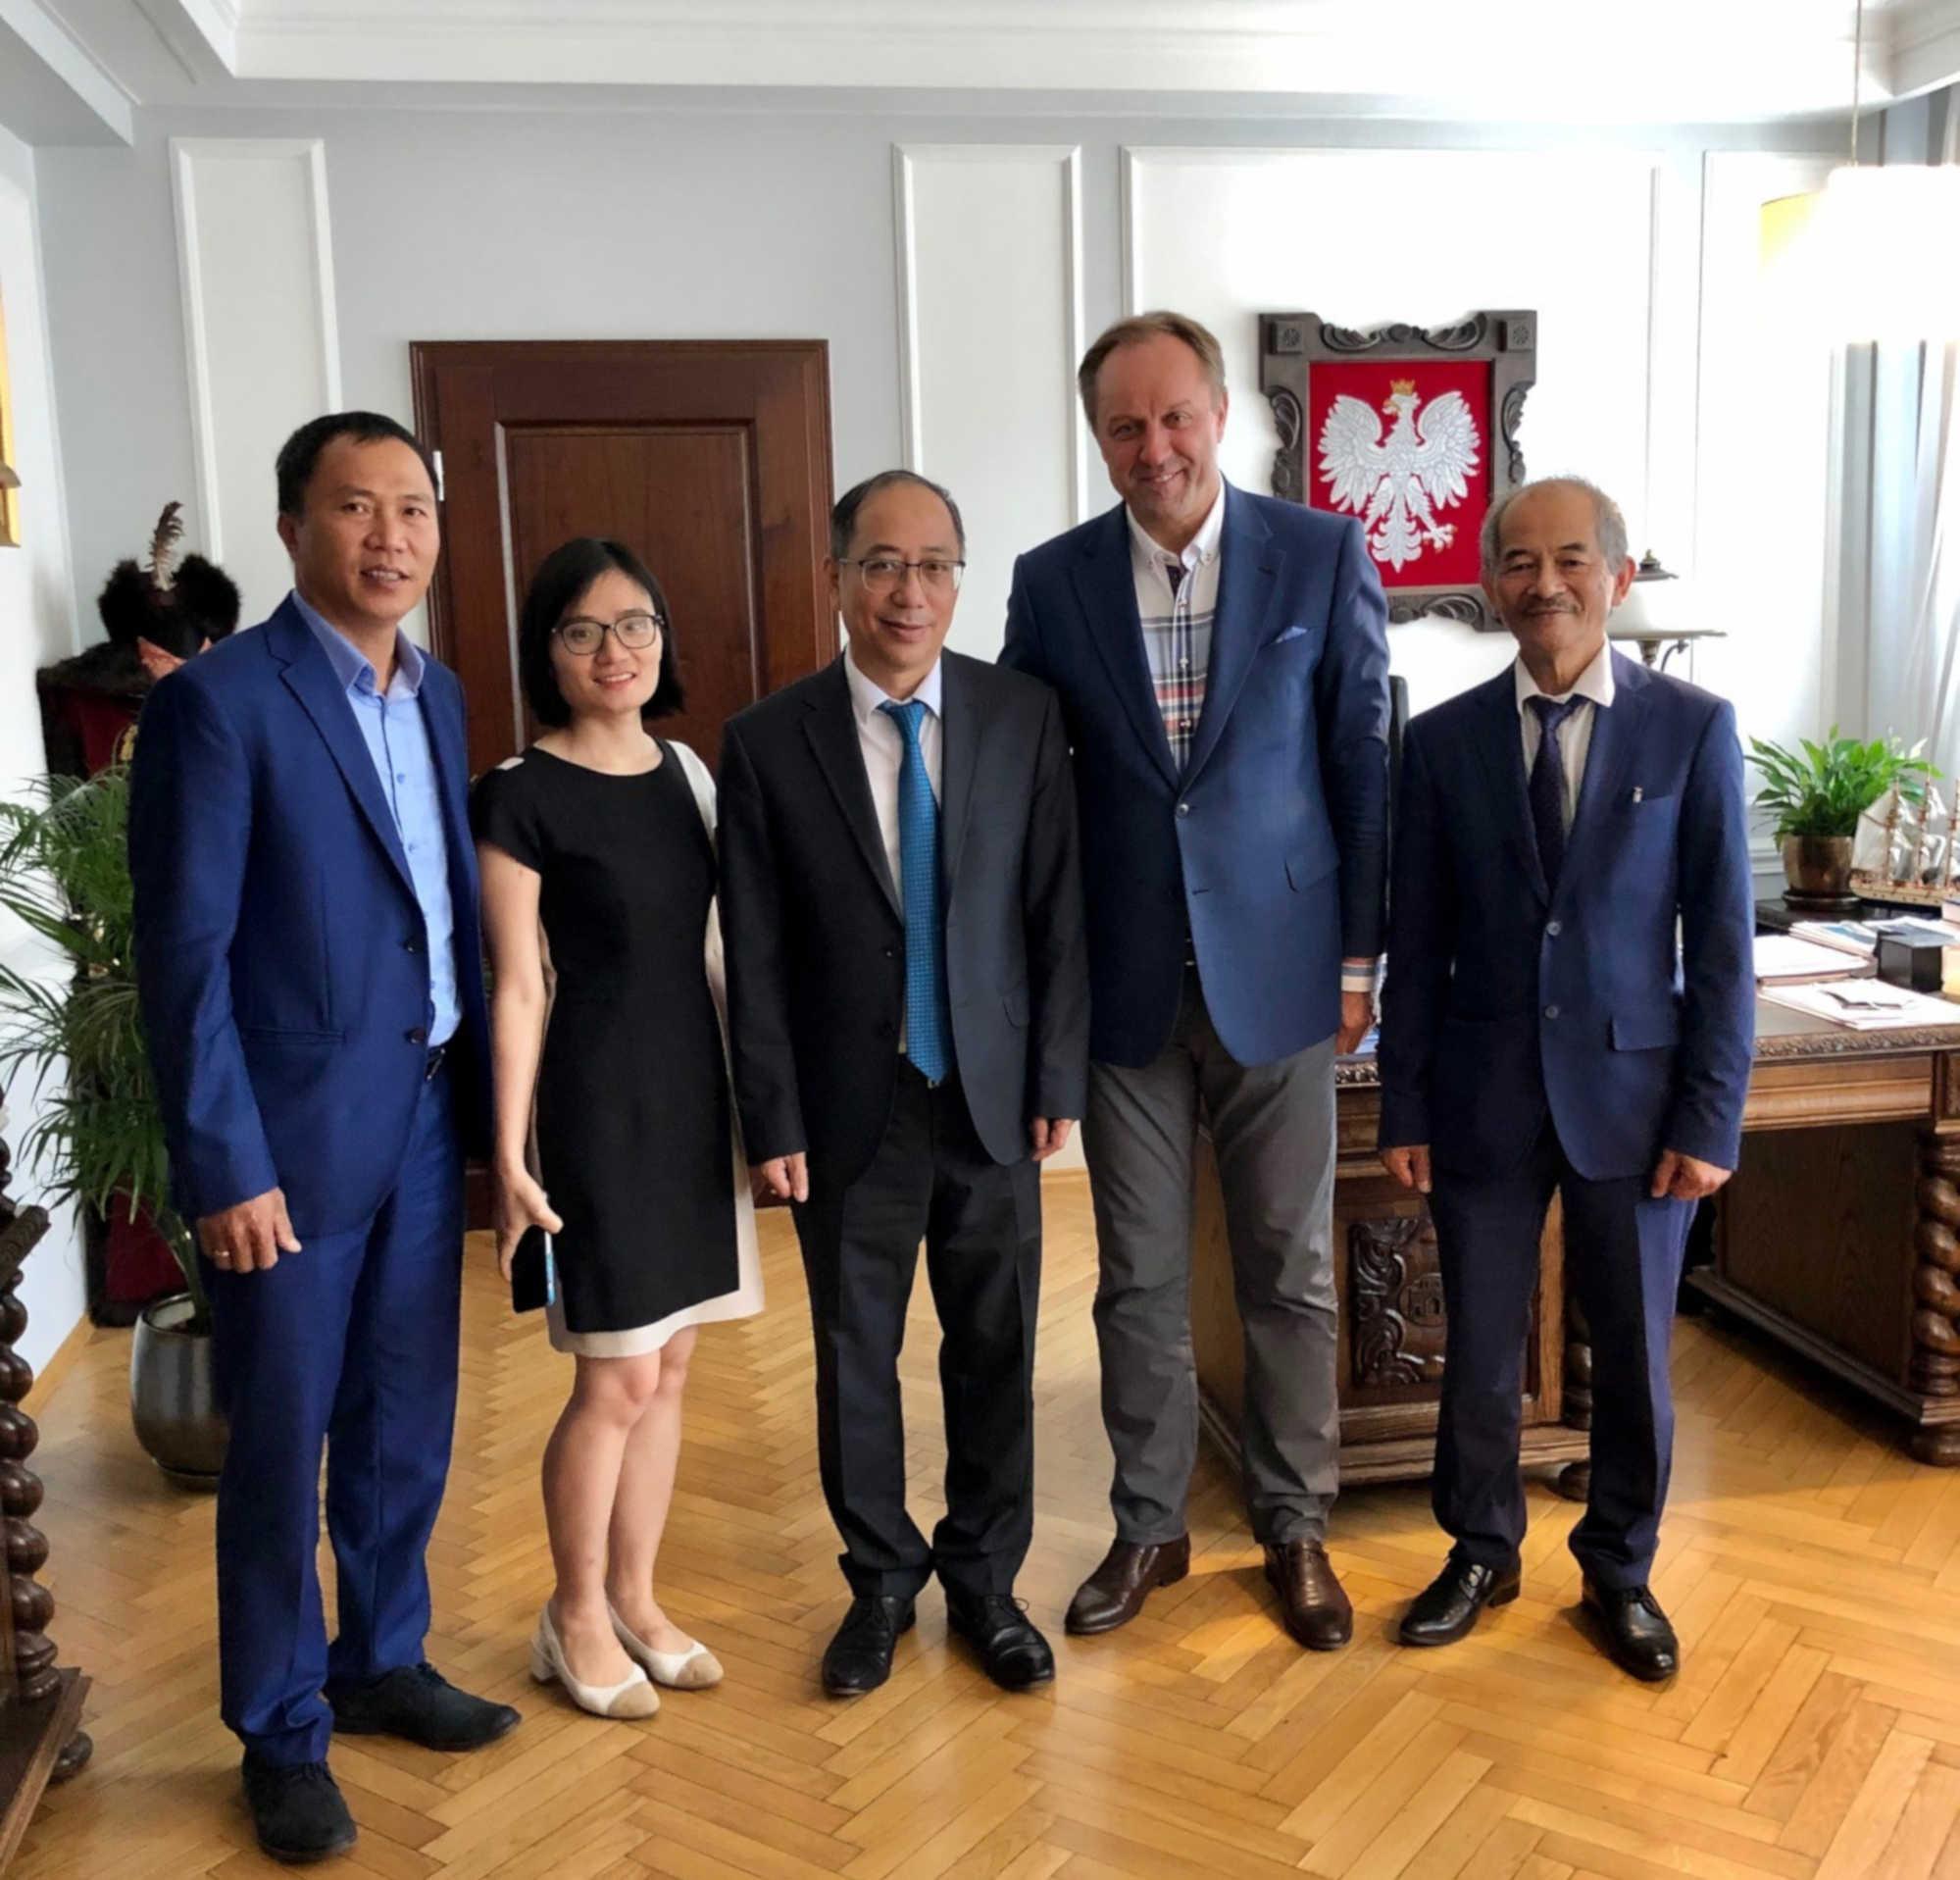 Konkretne rozmowy o gospodarce morskiej, turystyce i pracy. Wizyta ambasadora Wietnamu